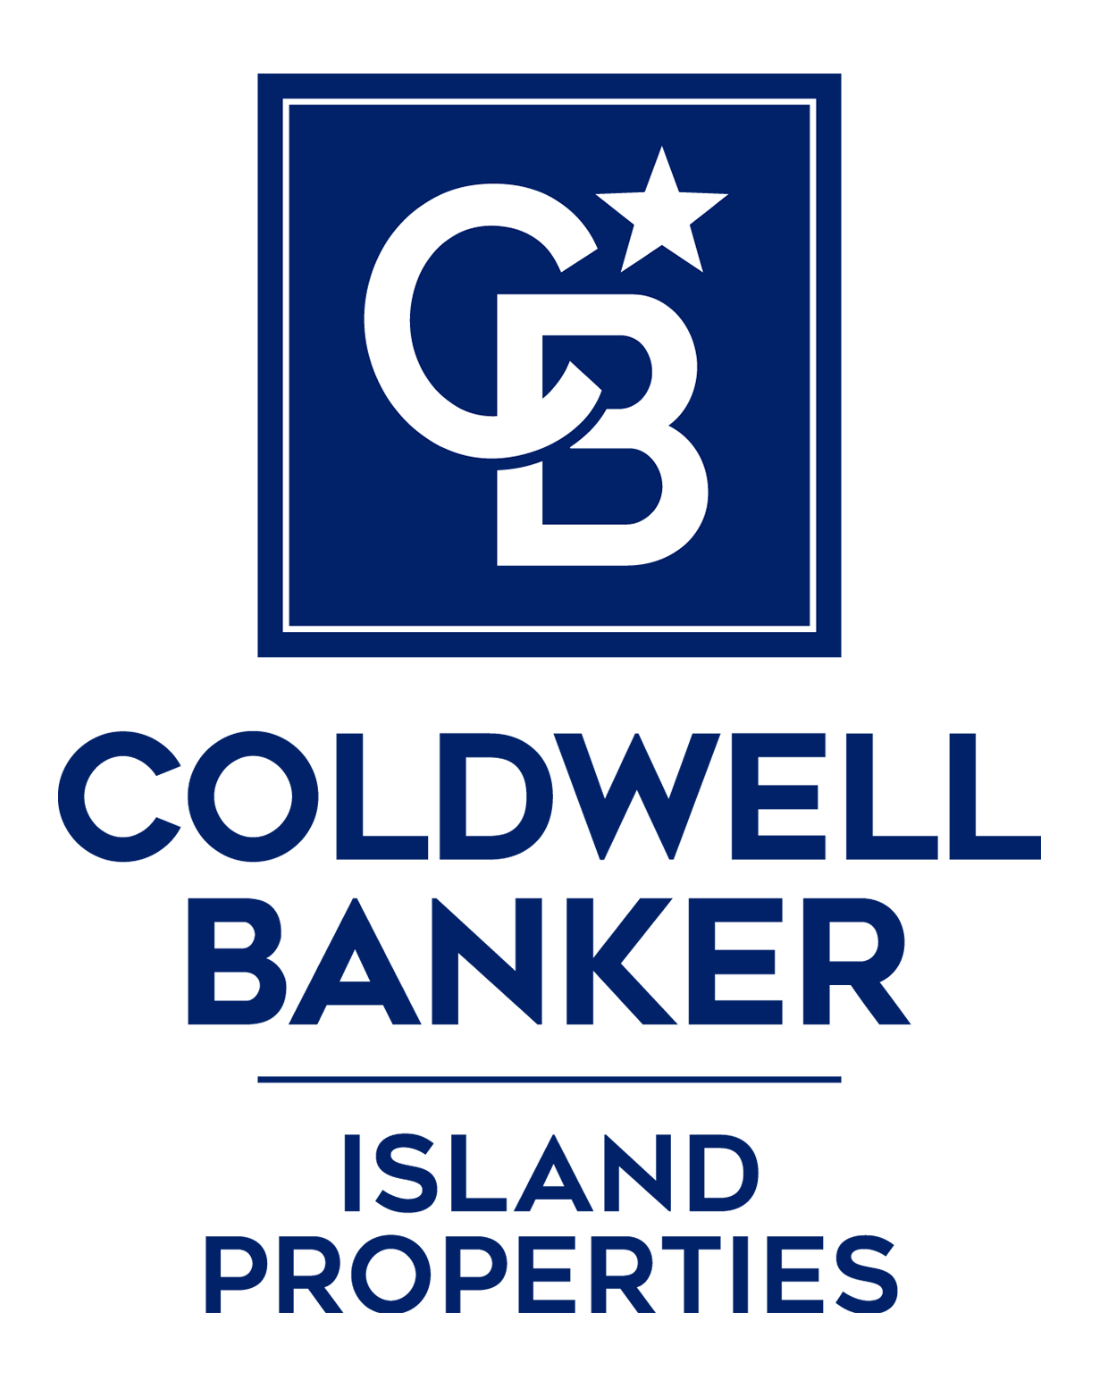 Ilona Coffey - Coldwell Banker Island Properties Logo